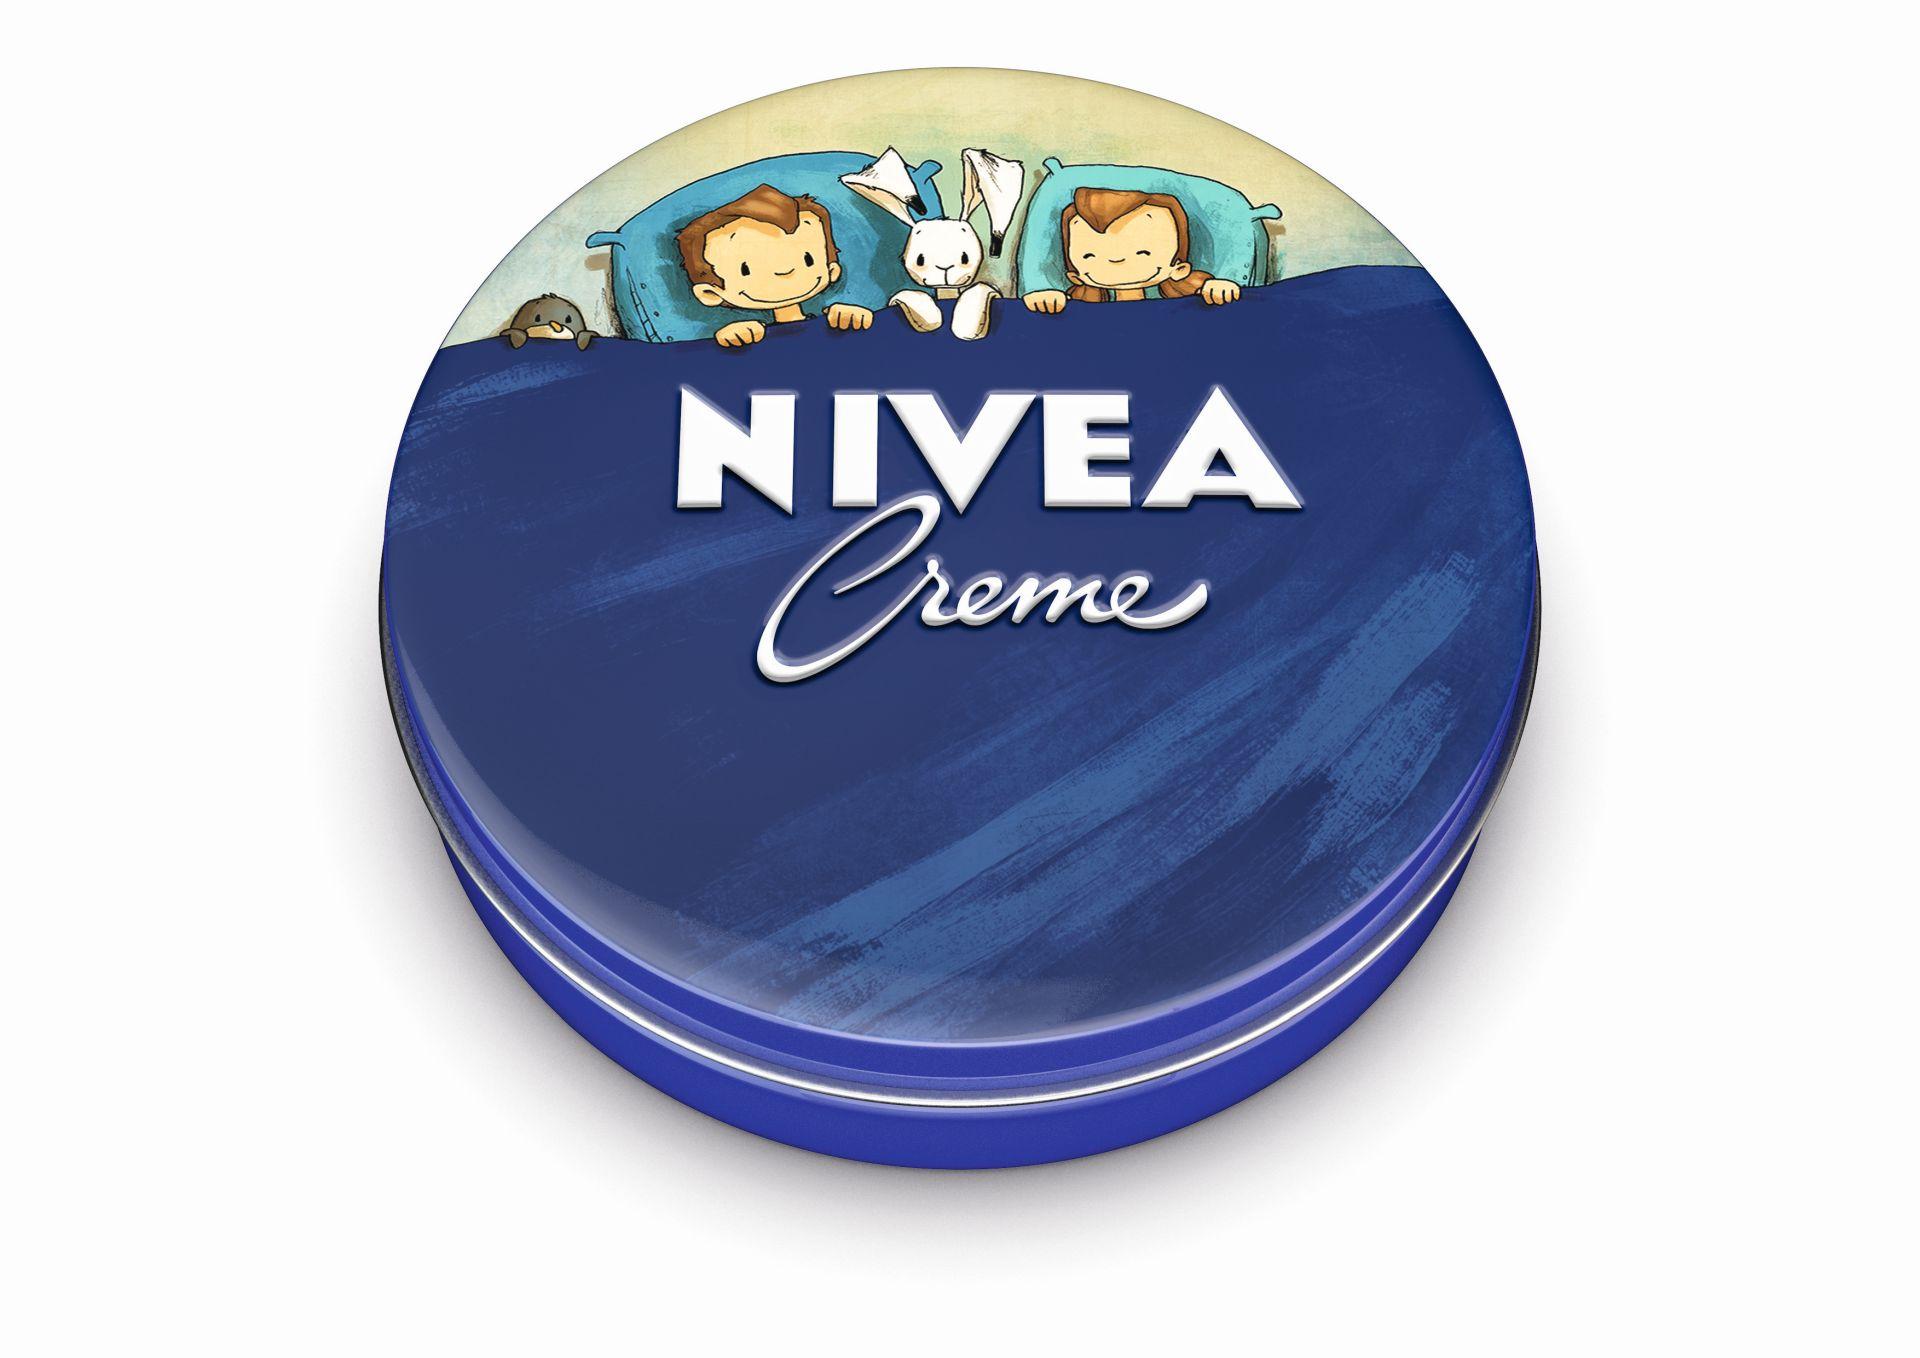 Patrunde in lumea fascinanta a povestilor NIVEA